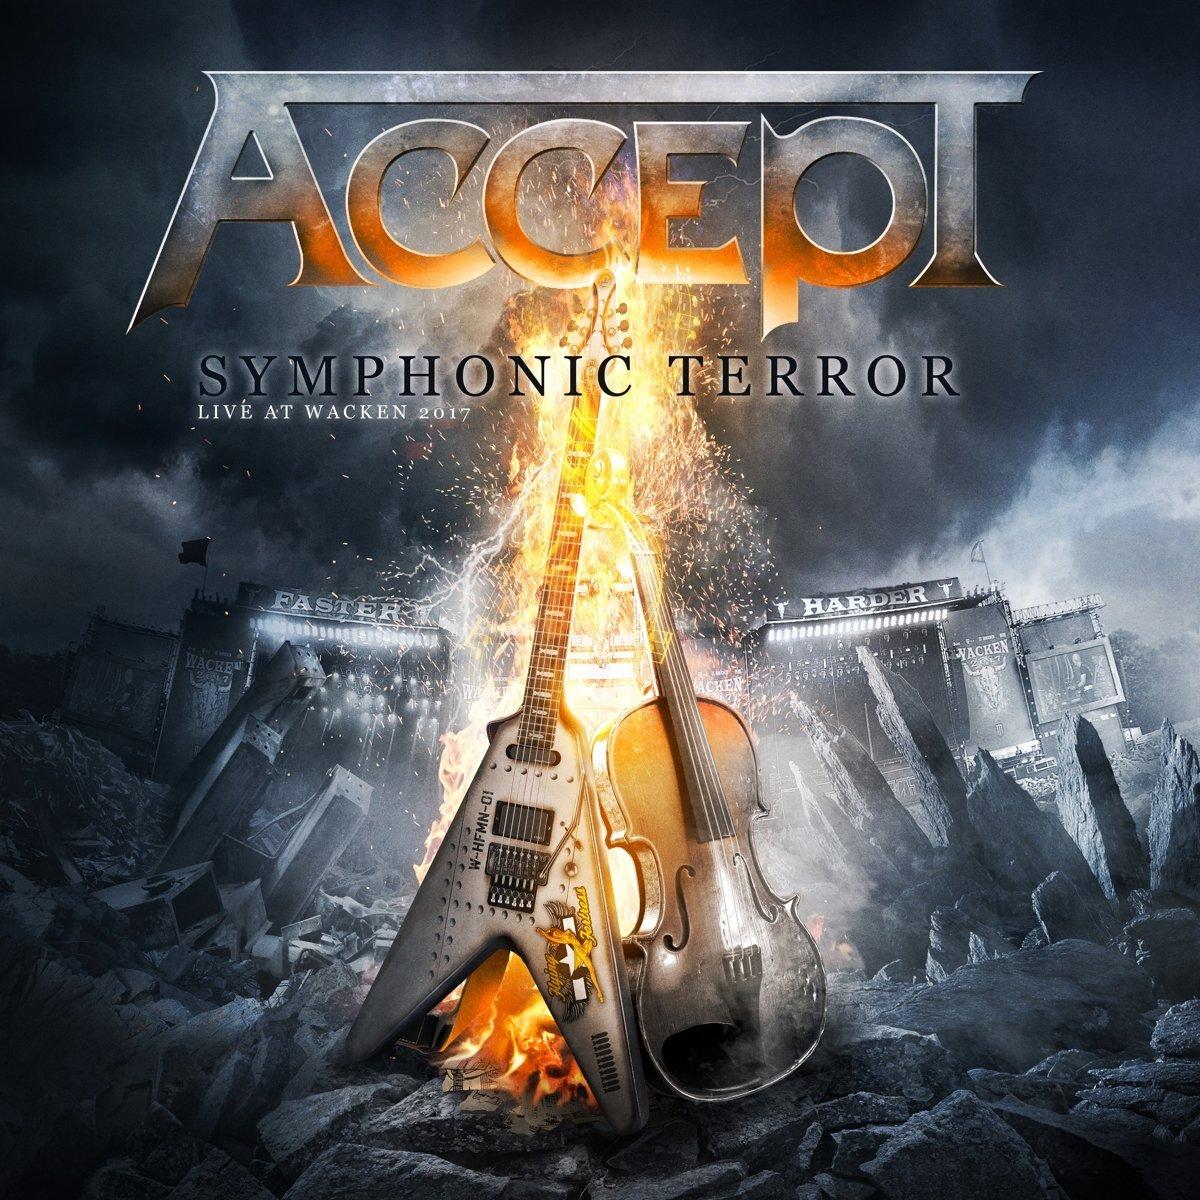 accept symphonic terror live at wacken 2017 album cover